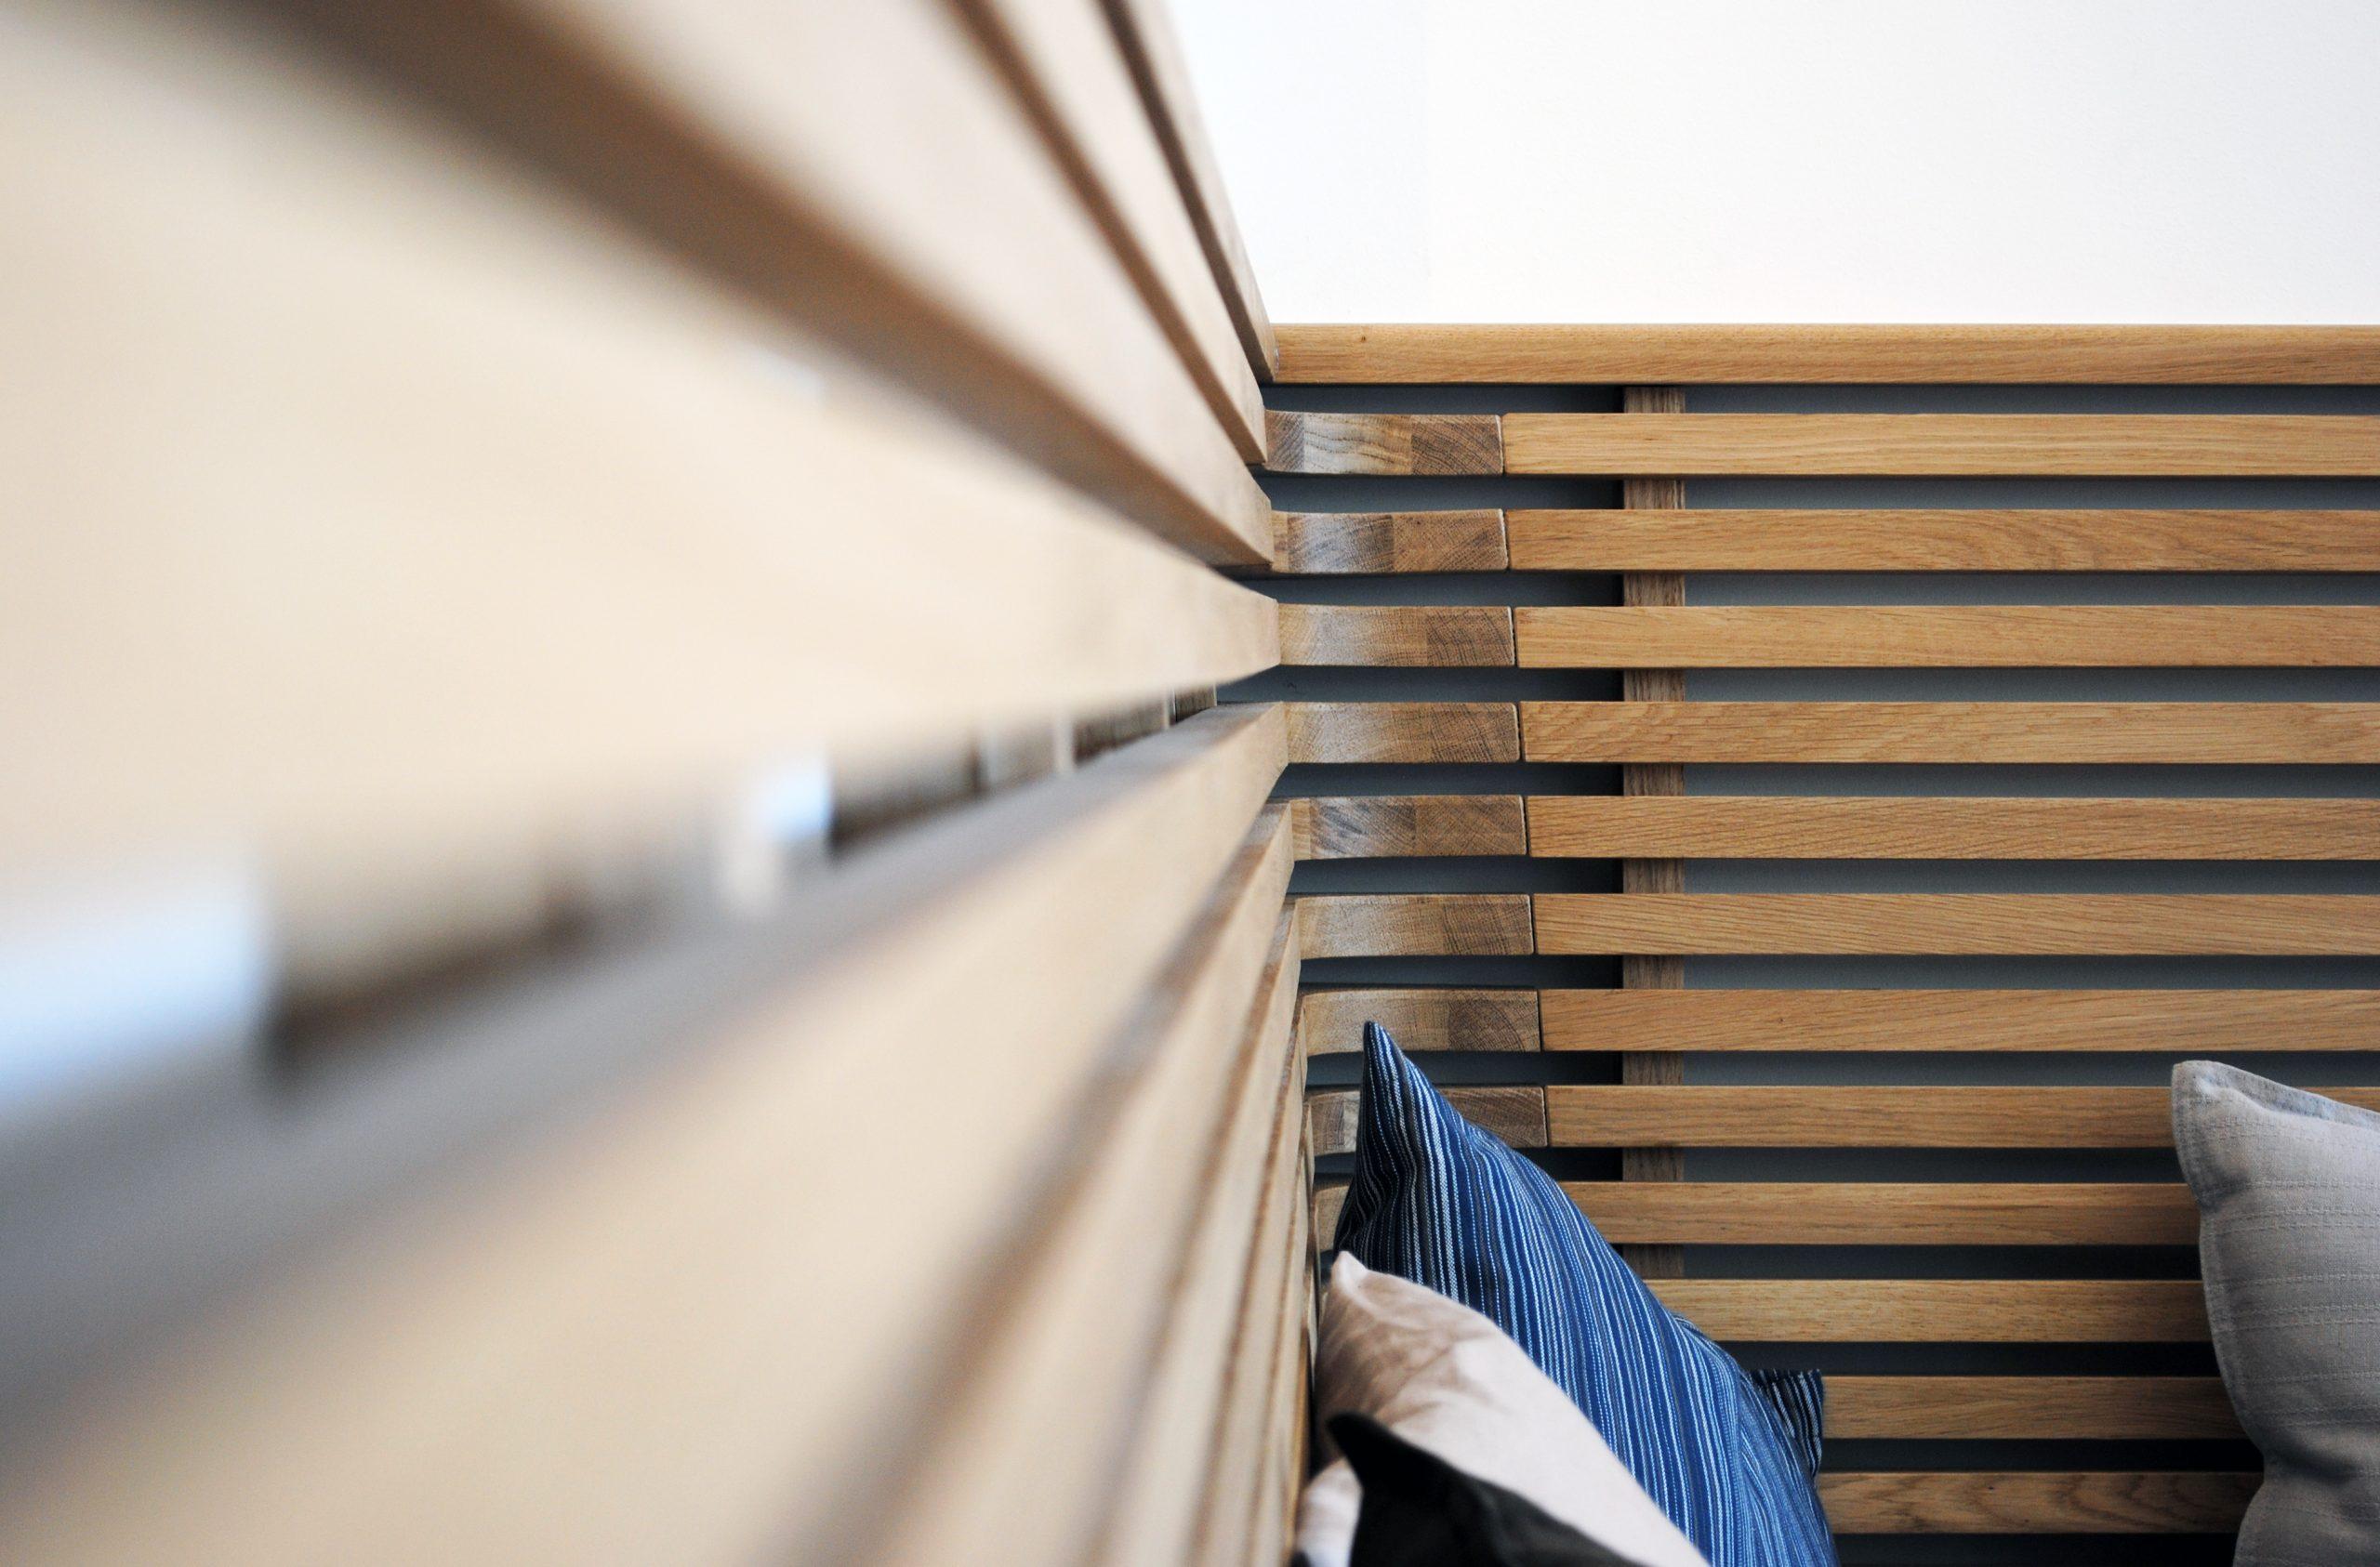 jacob-mayer-voigt-architekt-interior-design-sitzbank-holz